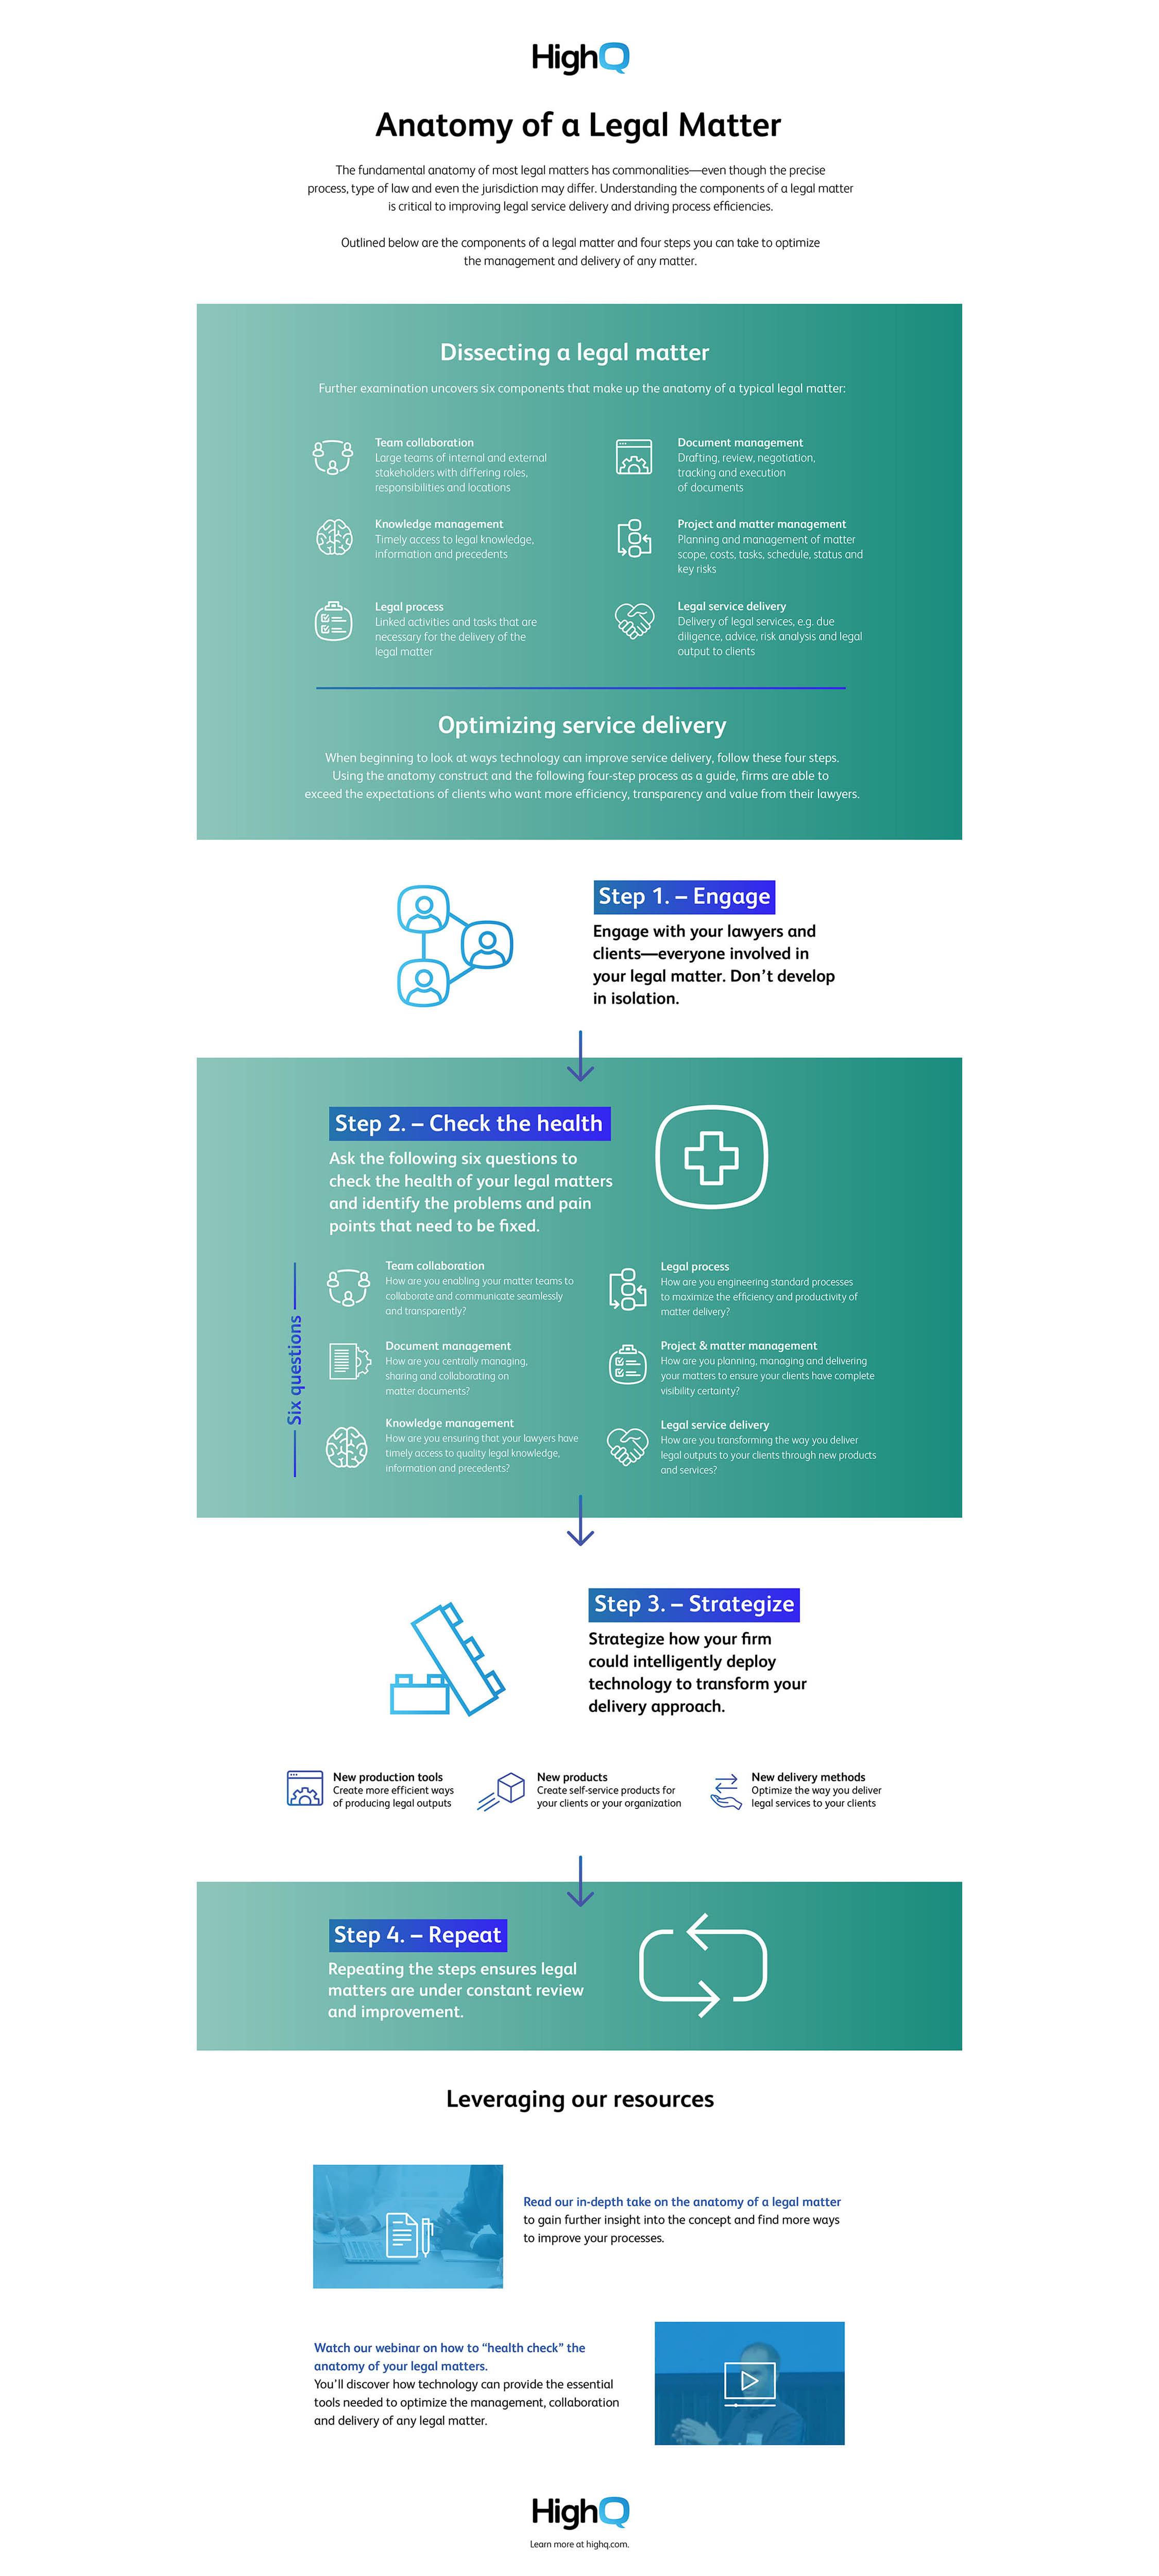 Infographic_Anatomy of a legal matter-final-USWebsite.jpg